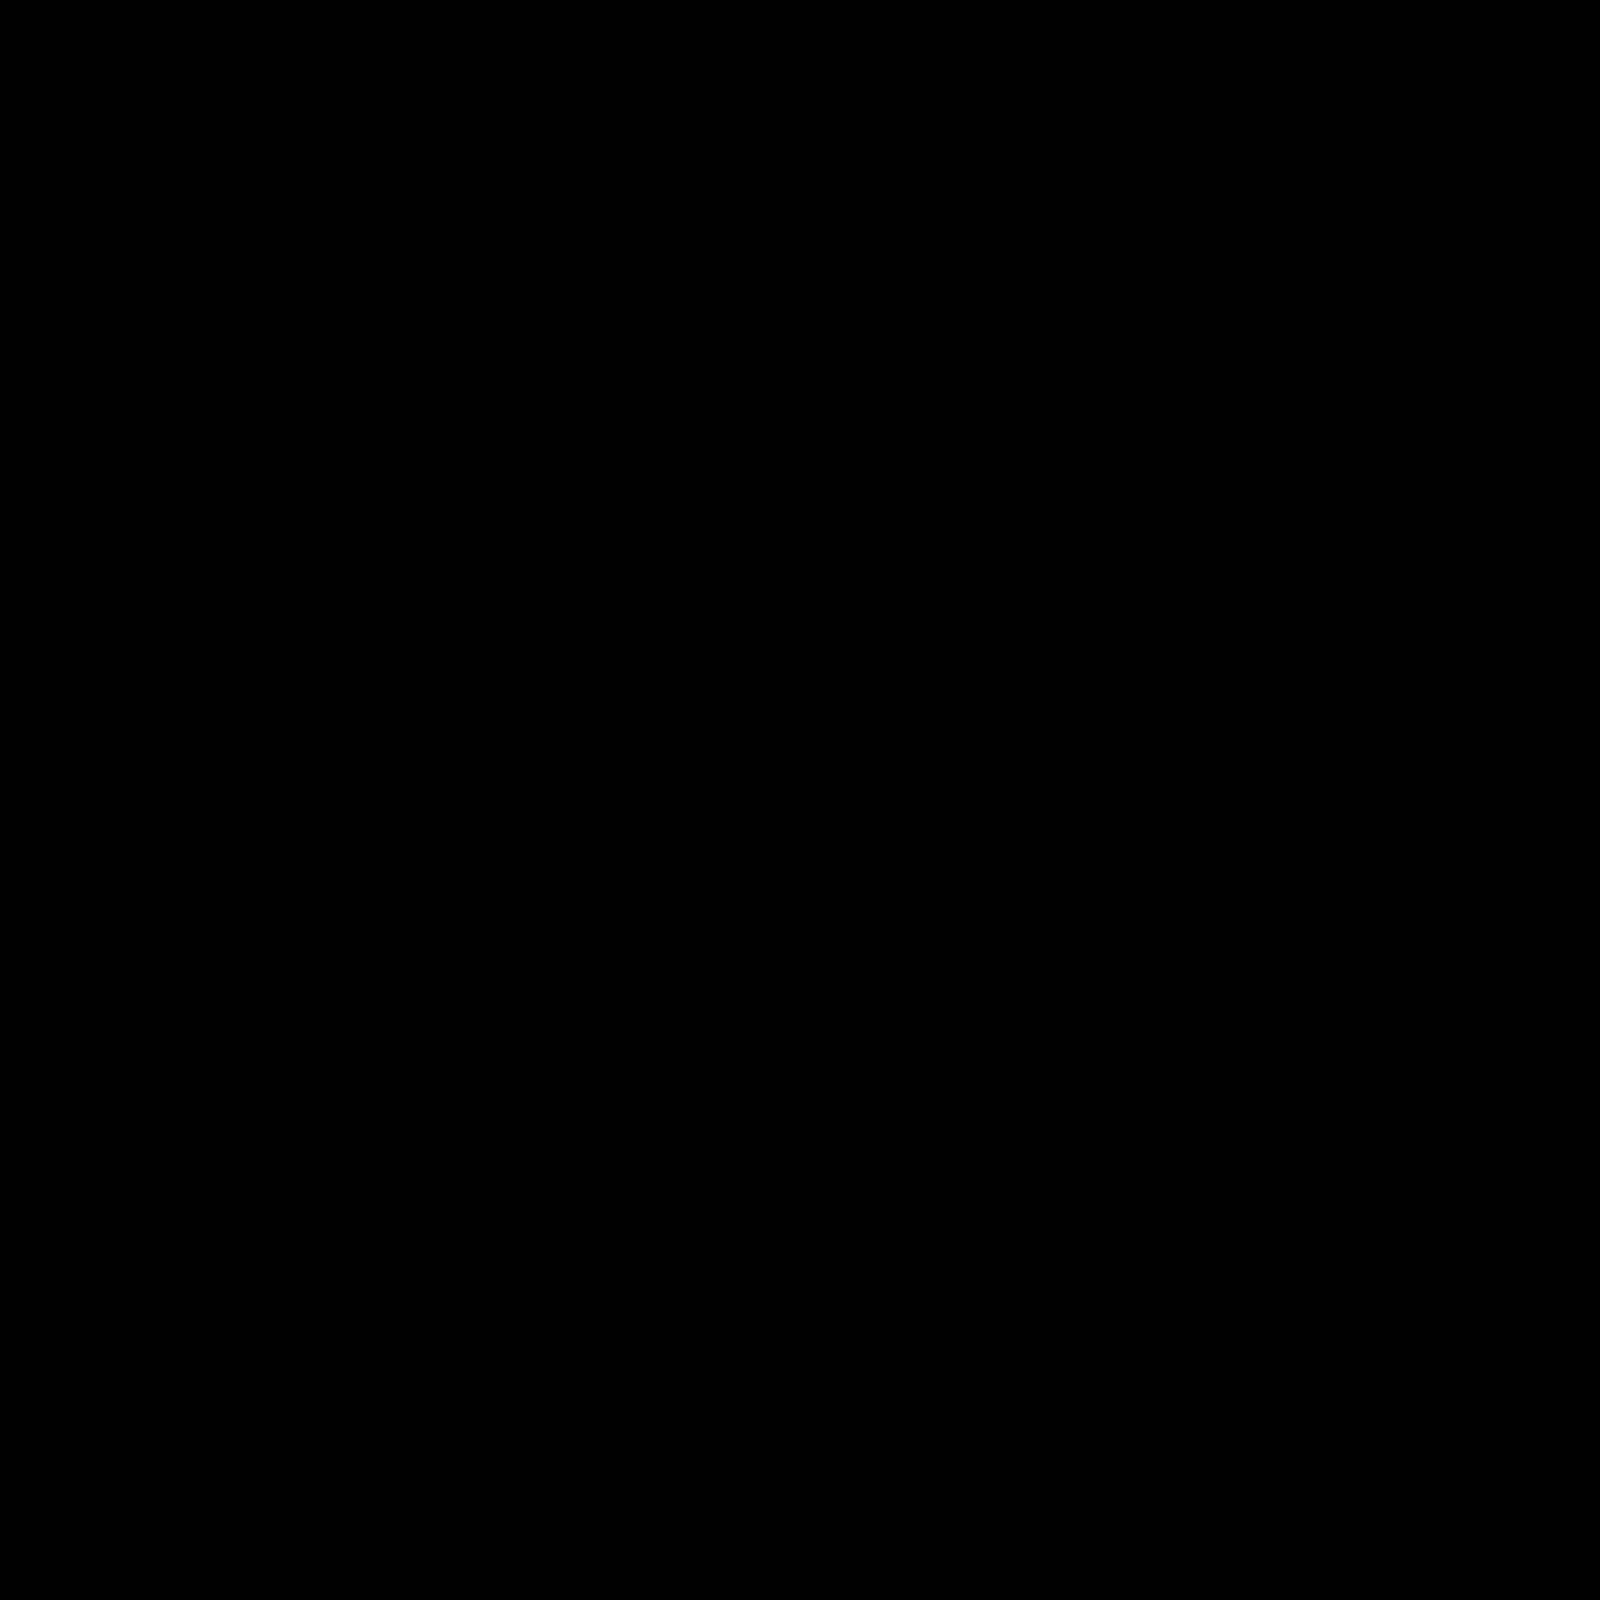 Decision icon